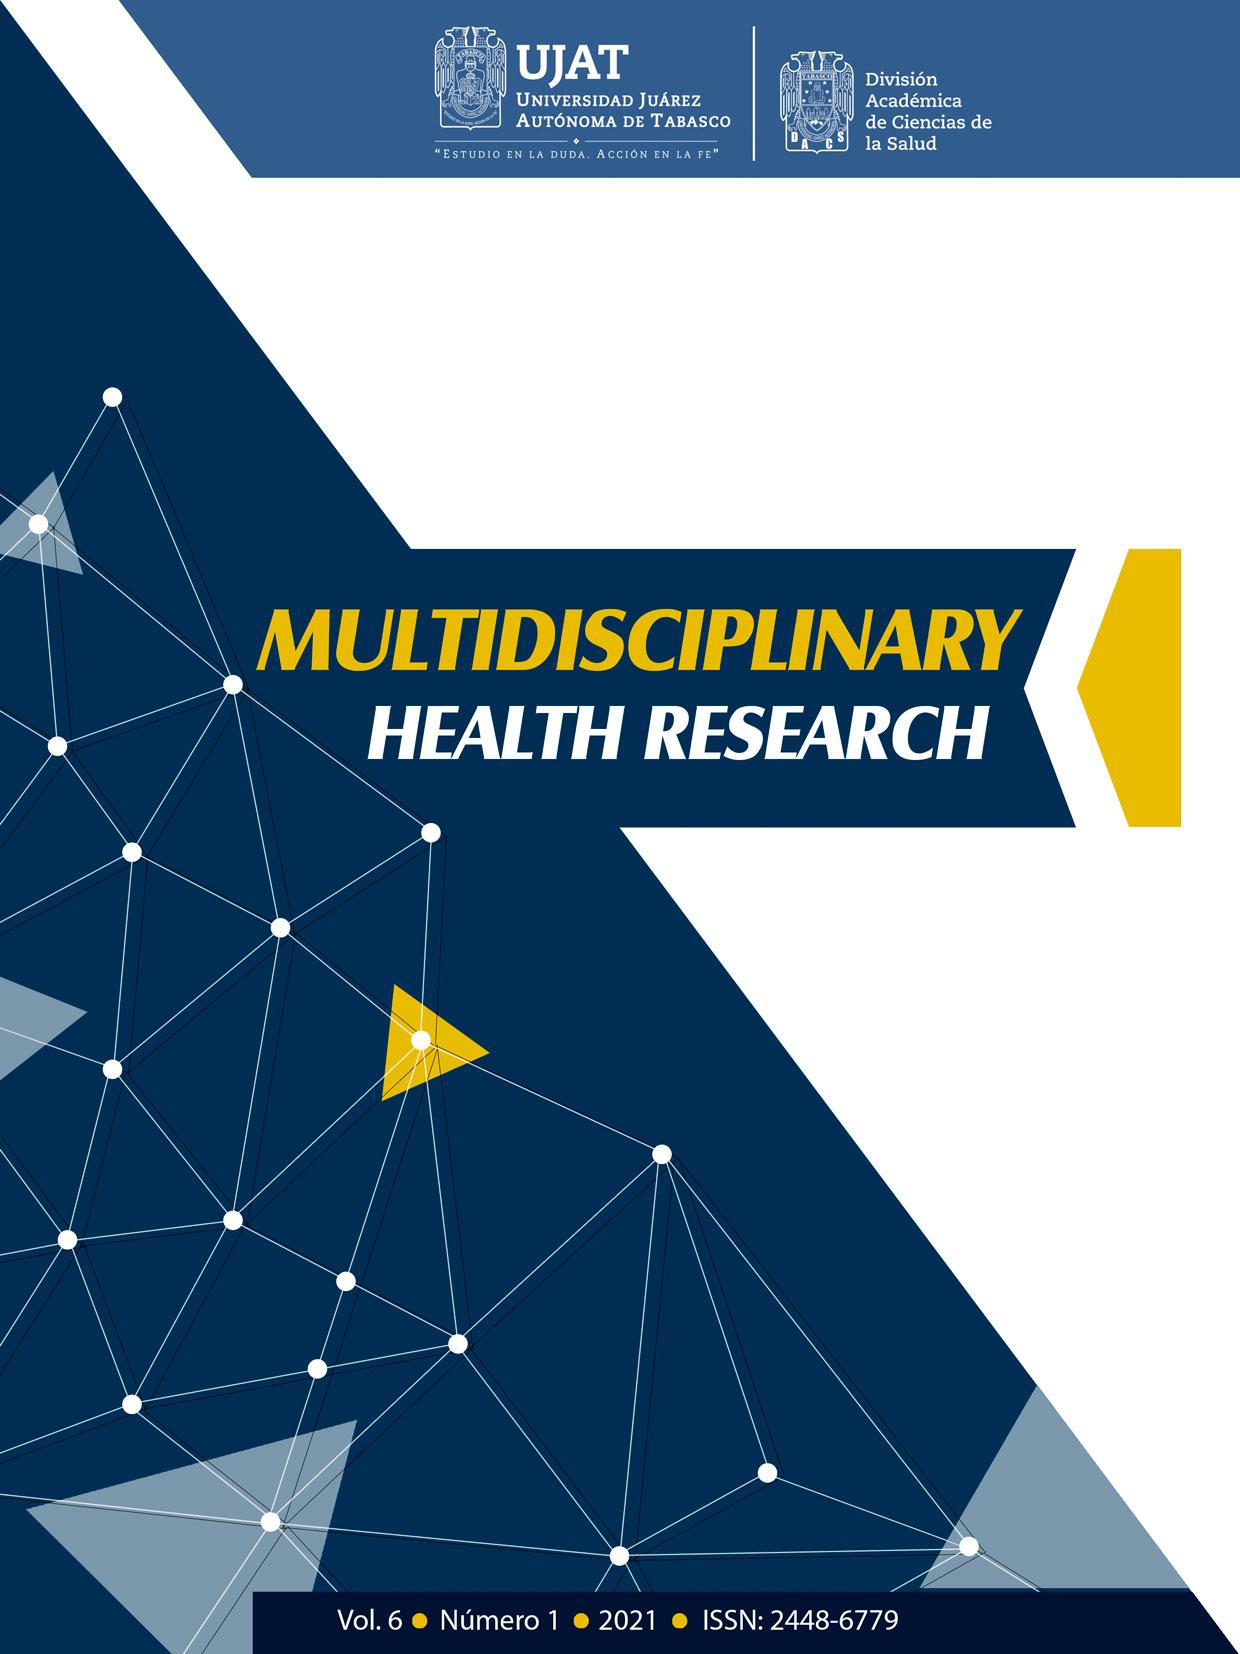 Ver Vol. 6 Núm. 1 (2021): Multidisciplinary Health Research